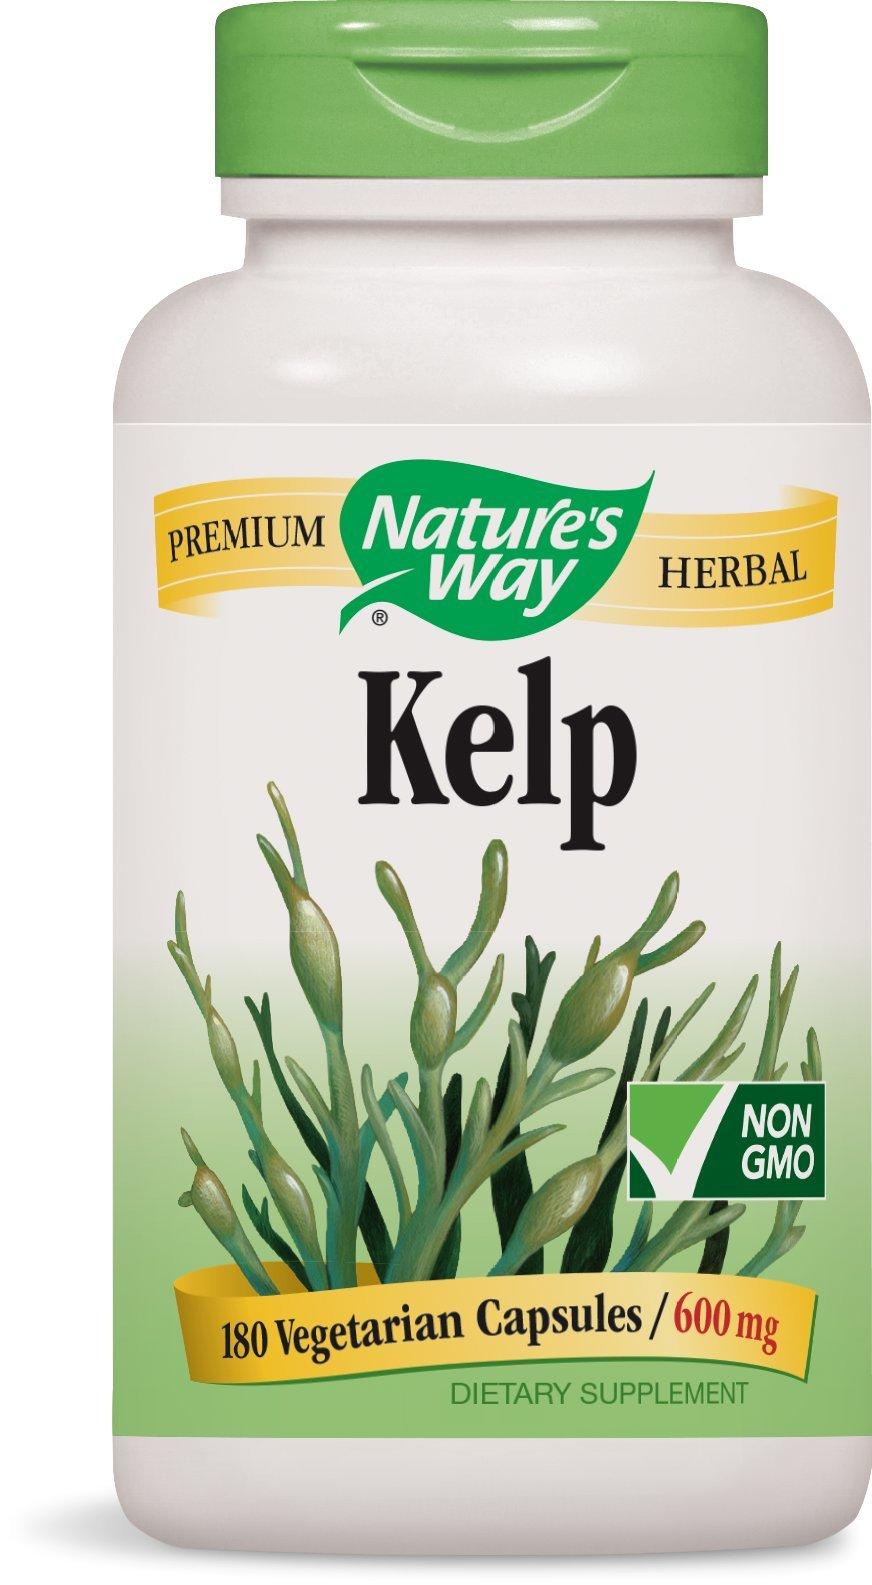 Nature's Way Kelp; 600 mg Kelp per serving; Non-GMO Project Verified; Gluten Free;Vegetarian;180 Vegetarian Capsules